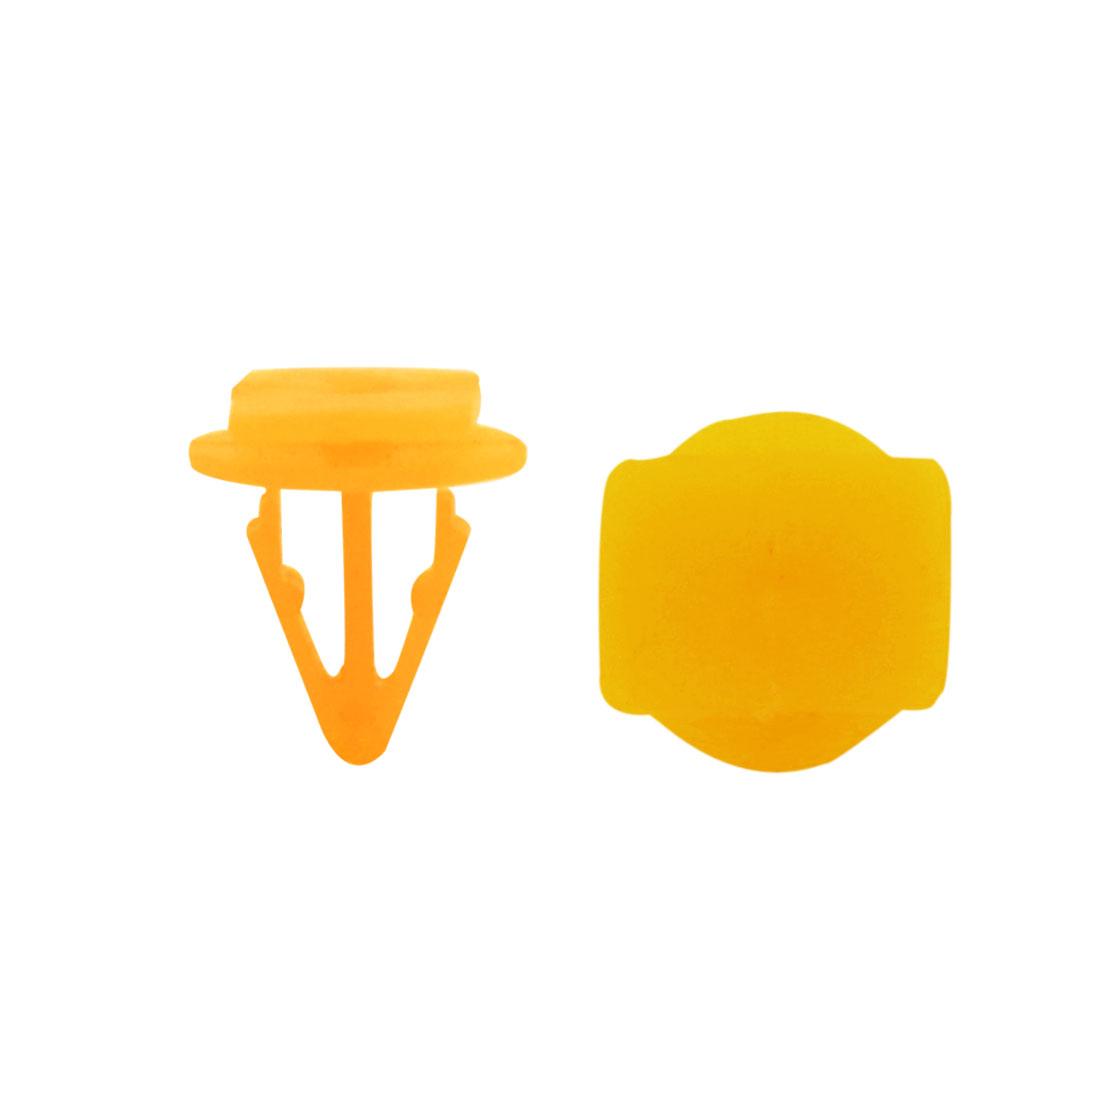 30Pcs Plastic Rivets Carpet Floor Mat Clips 10mm Hole Dia Yellow for Auto Car